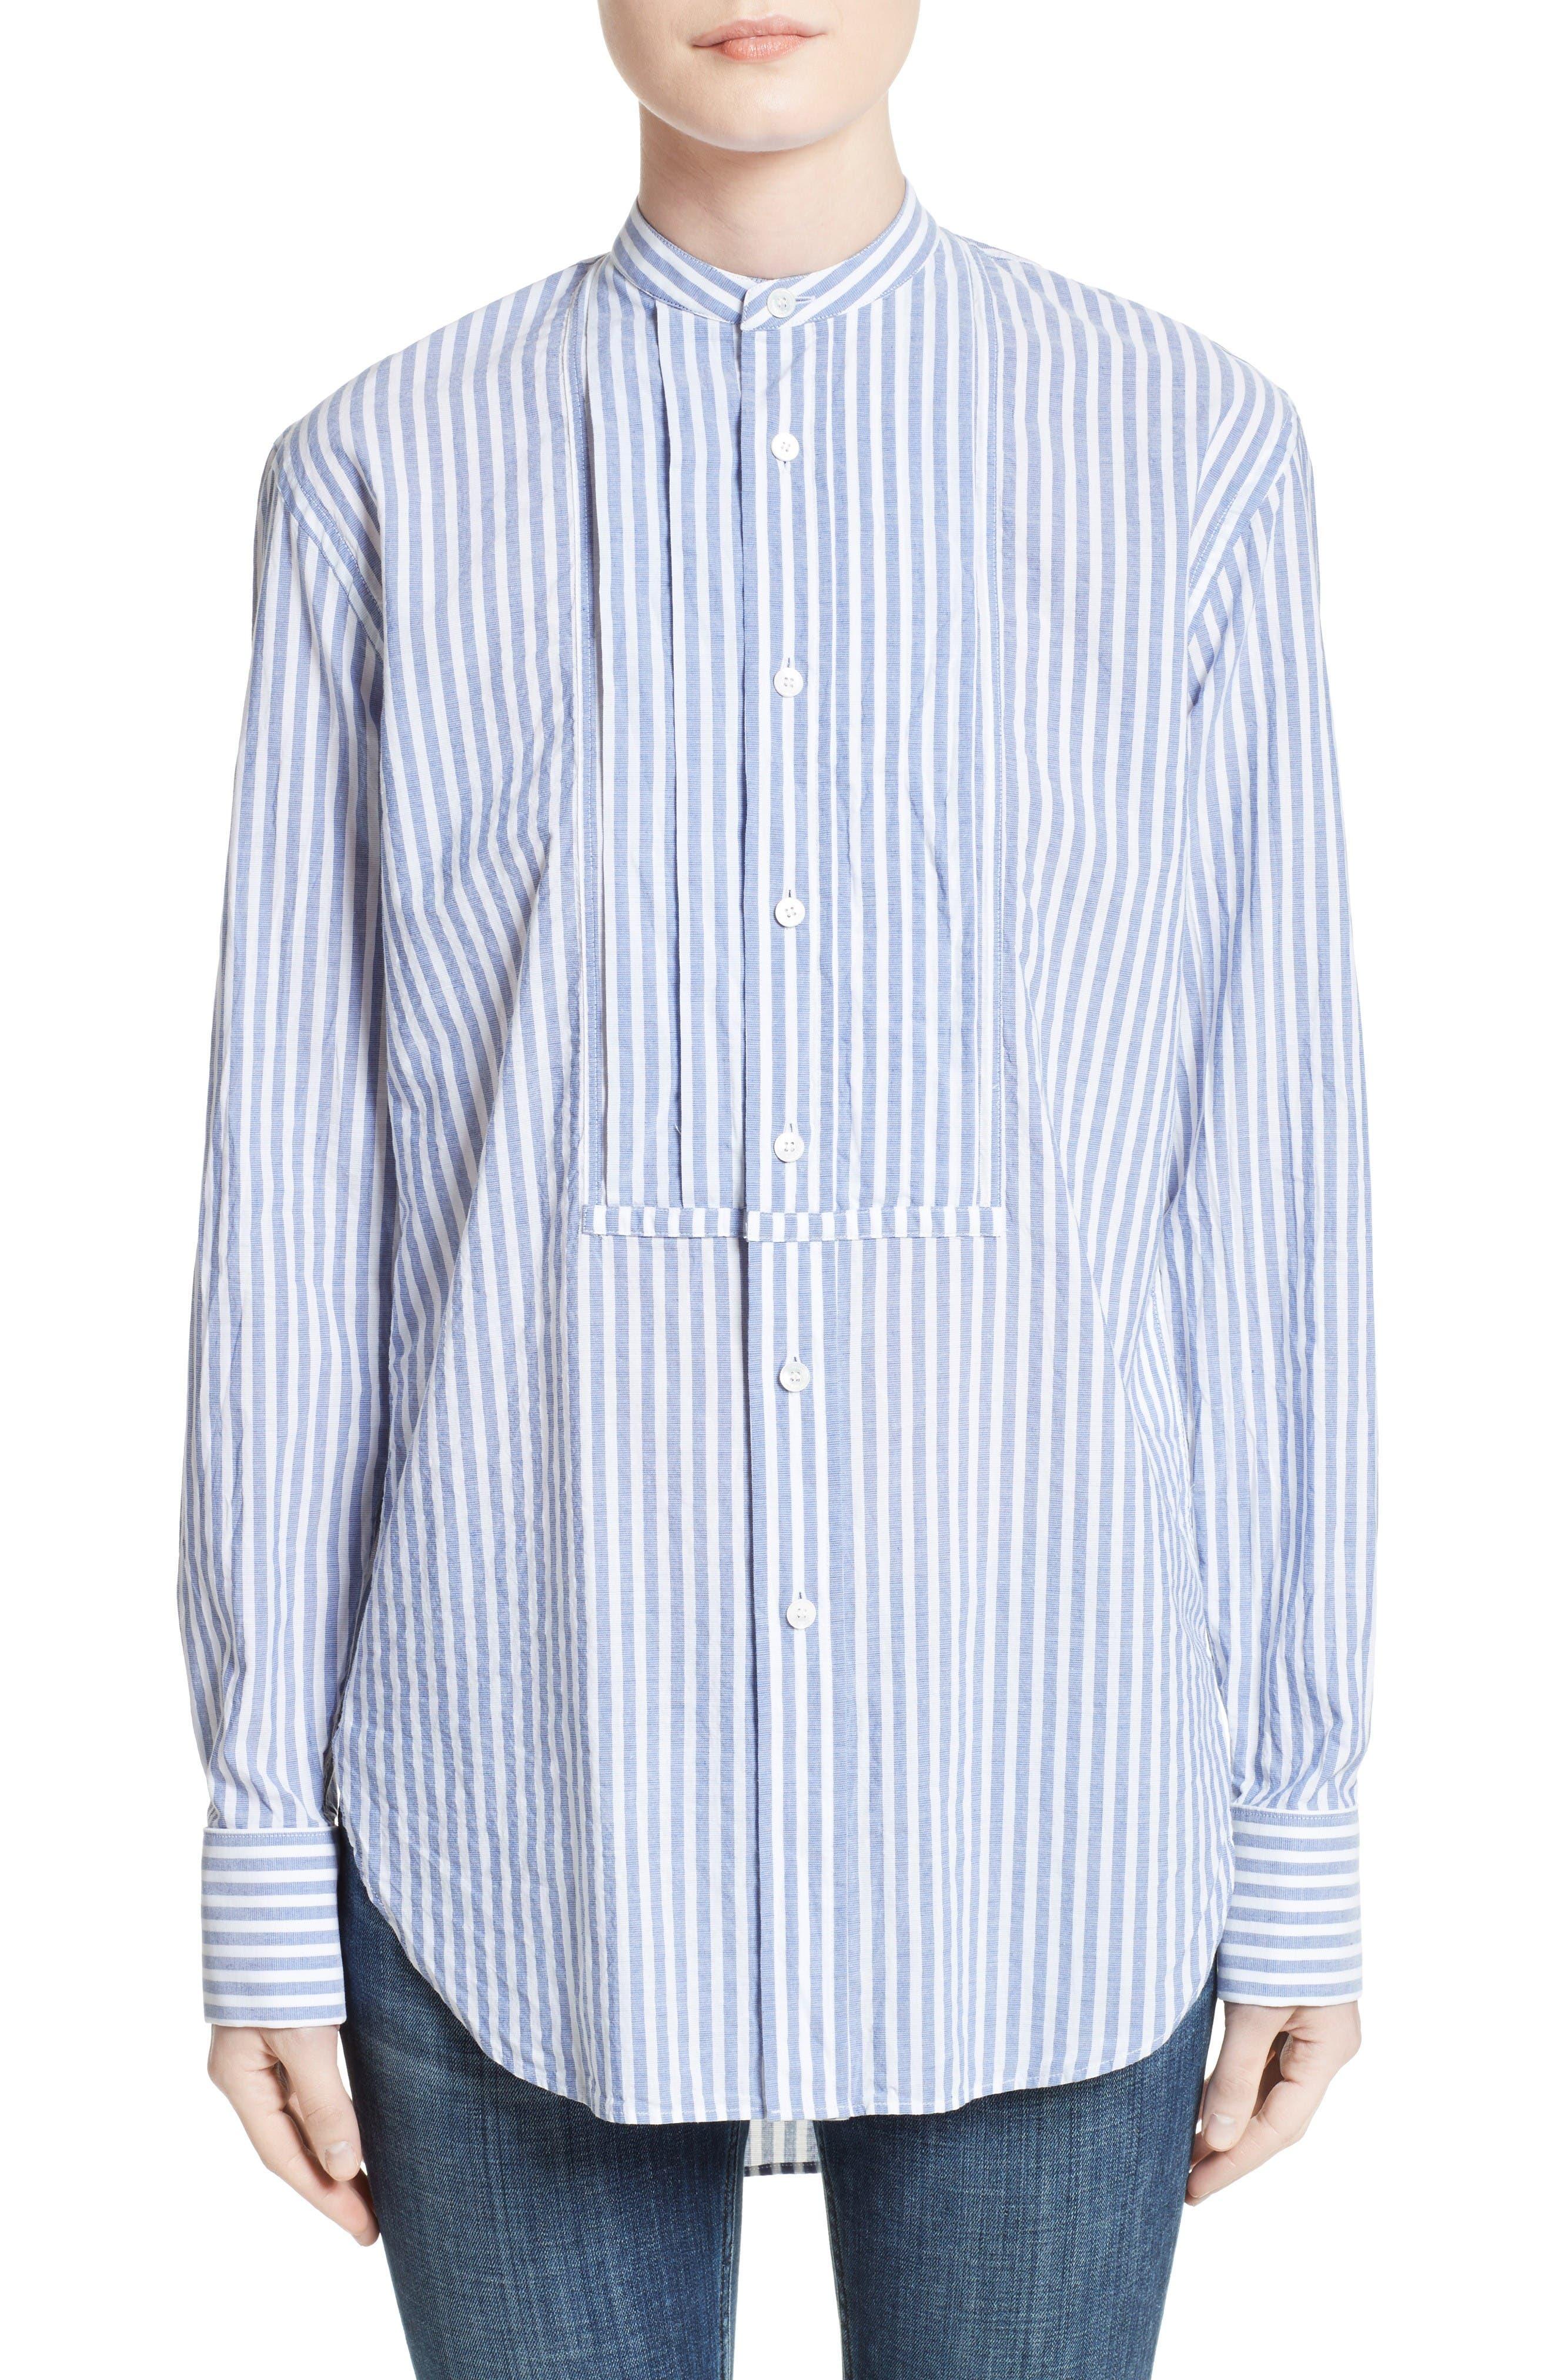 Burberry Benfleet Stripe Cotton Top